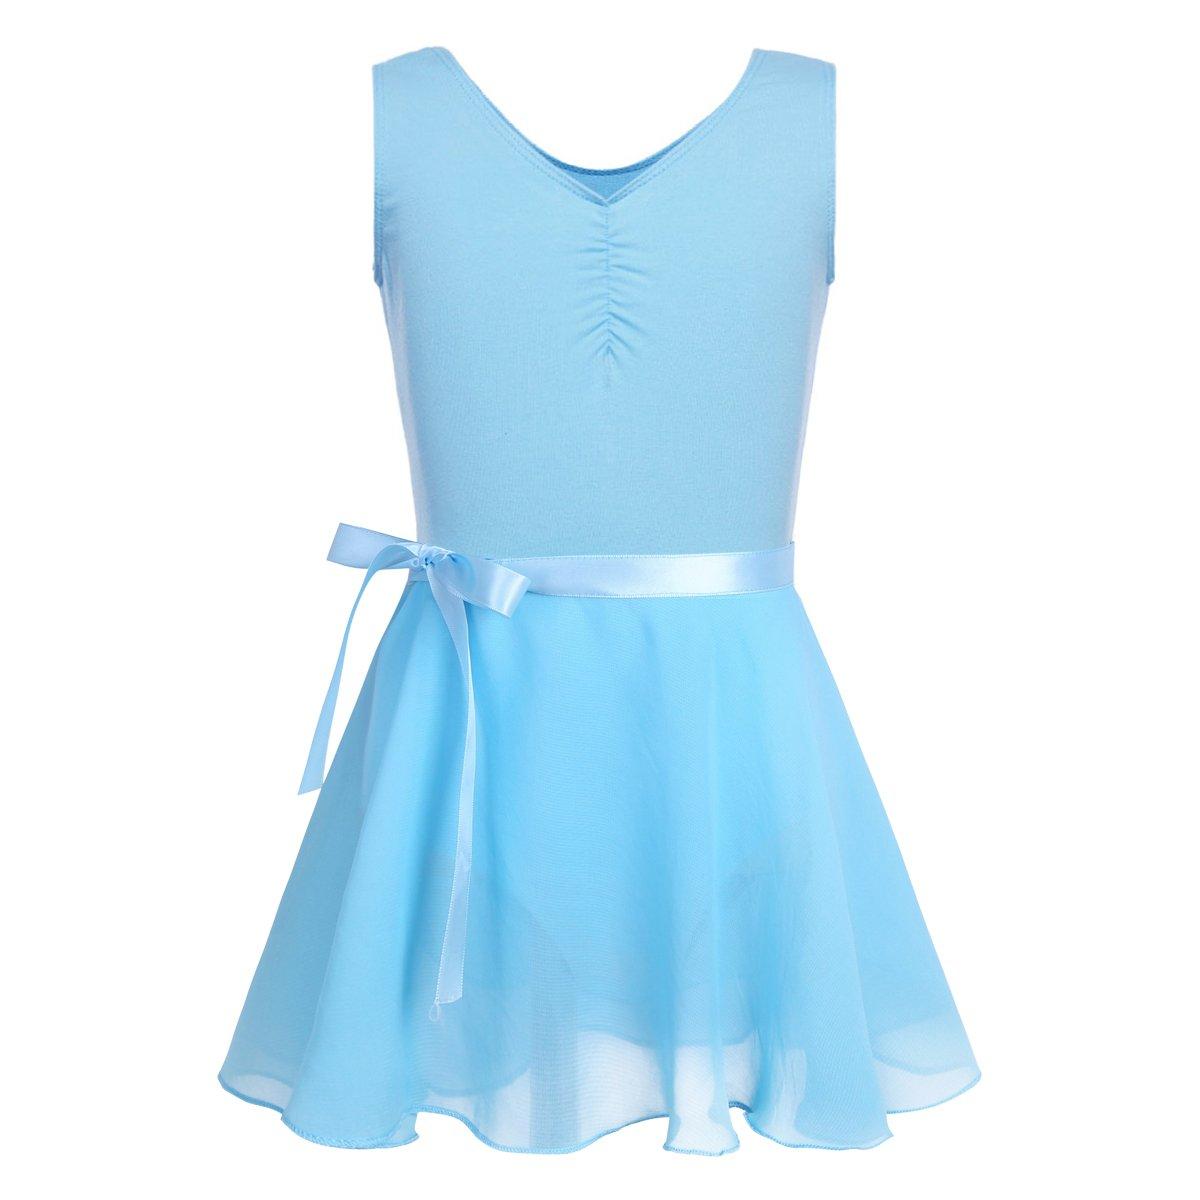 Freebily APPAREL ベビーガールズ ガールズ B07HGWK992 3--4|Sky Blue ( Sleeveless) Sky Blue ( Sleeveless) 3--4